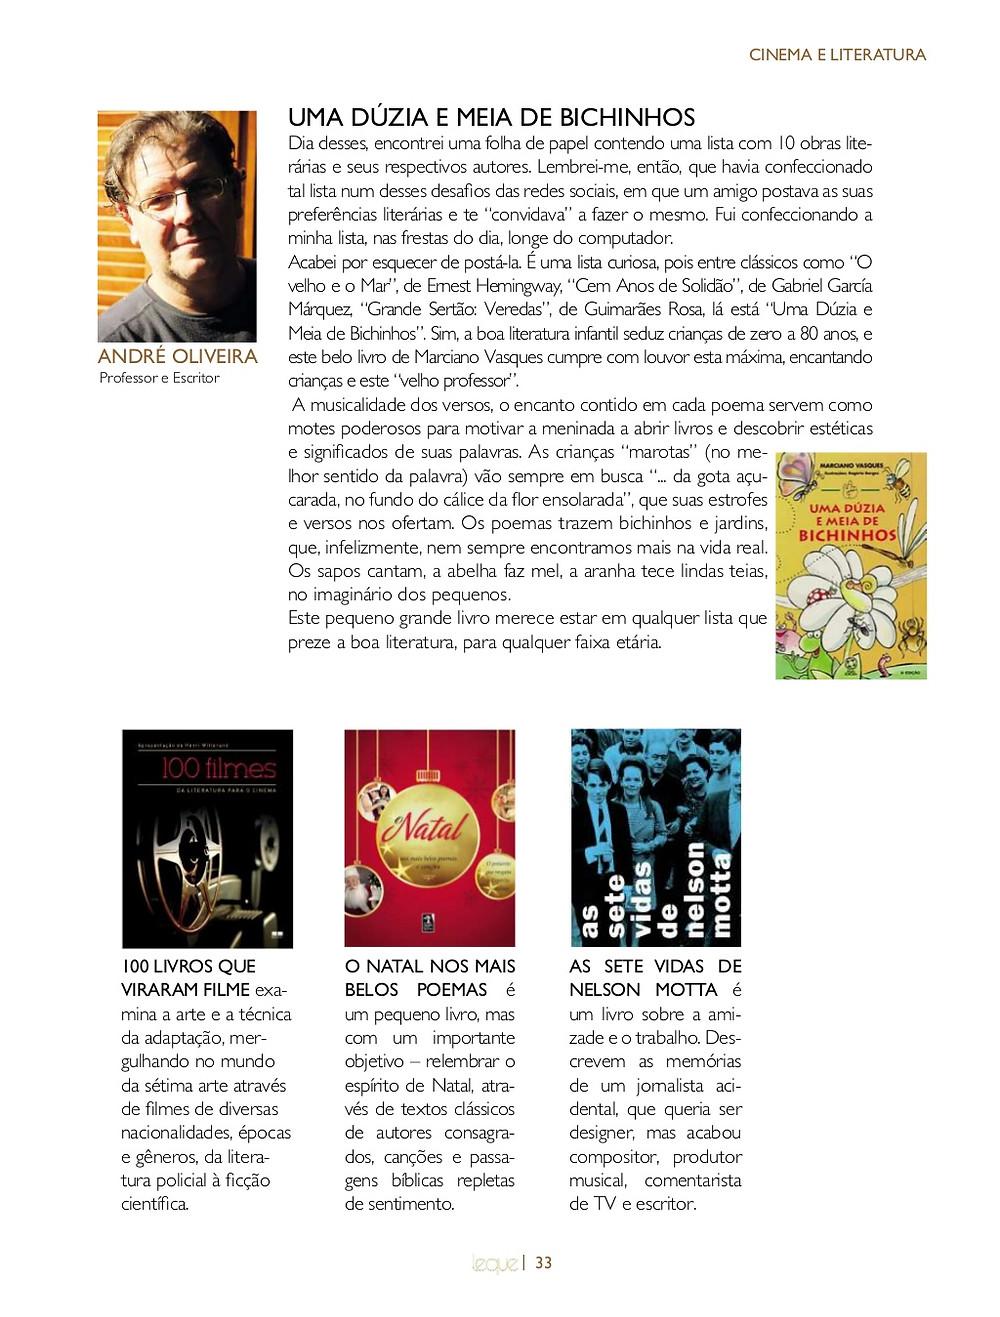 revista-leque-2-edio-dezembro14-31-1024.jpg